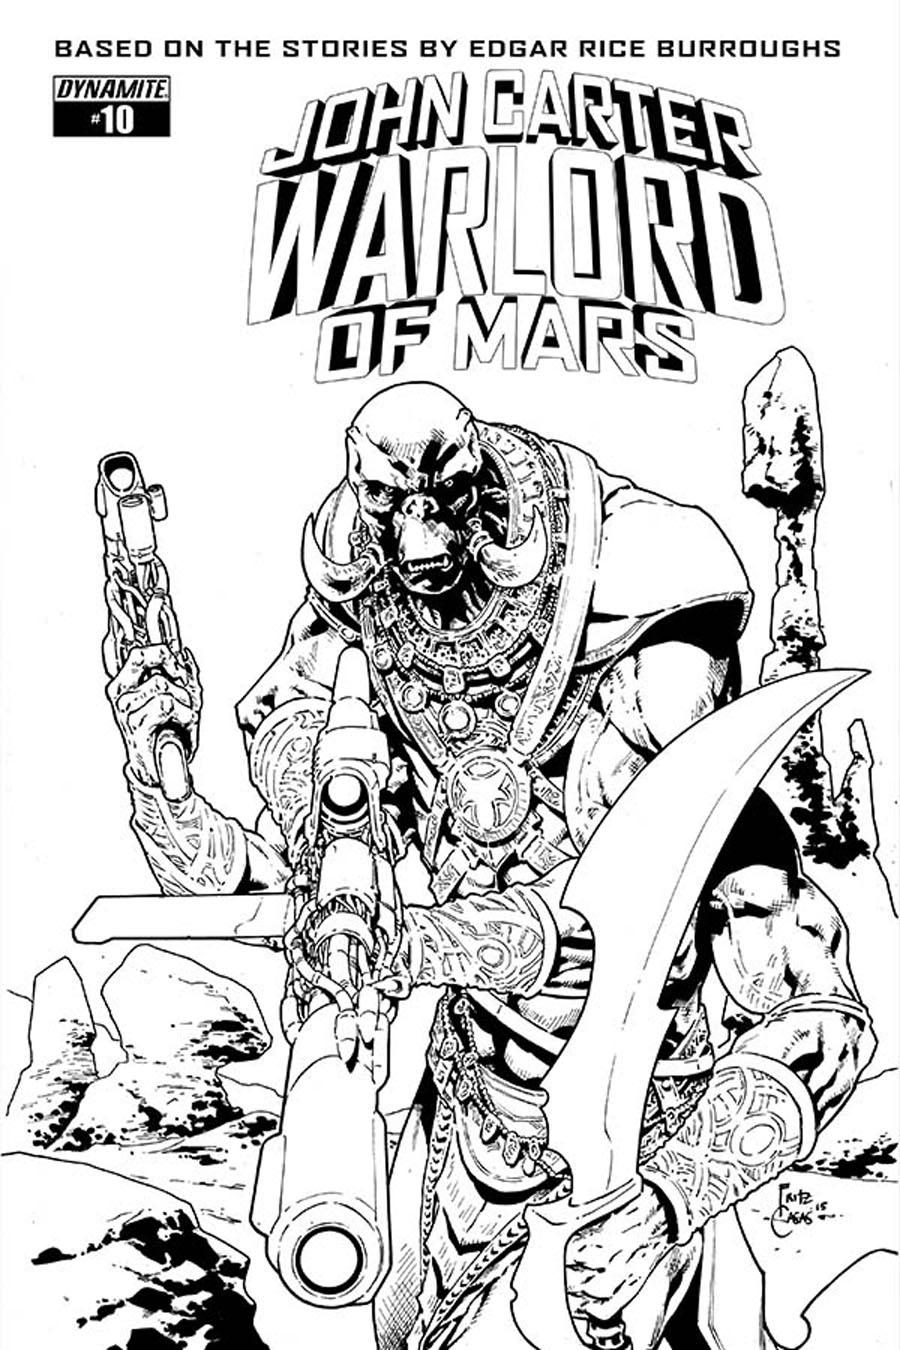 John Carter Warlord Of Mars Vol 2 #10 Cover E Incentive Fritz Casas Black & White Cover